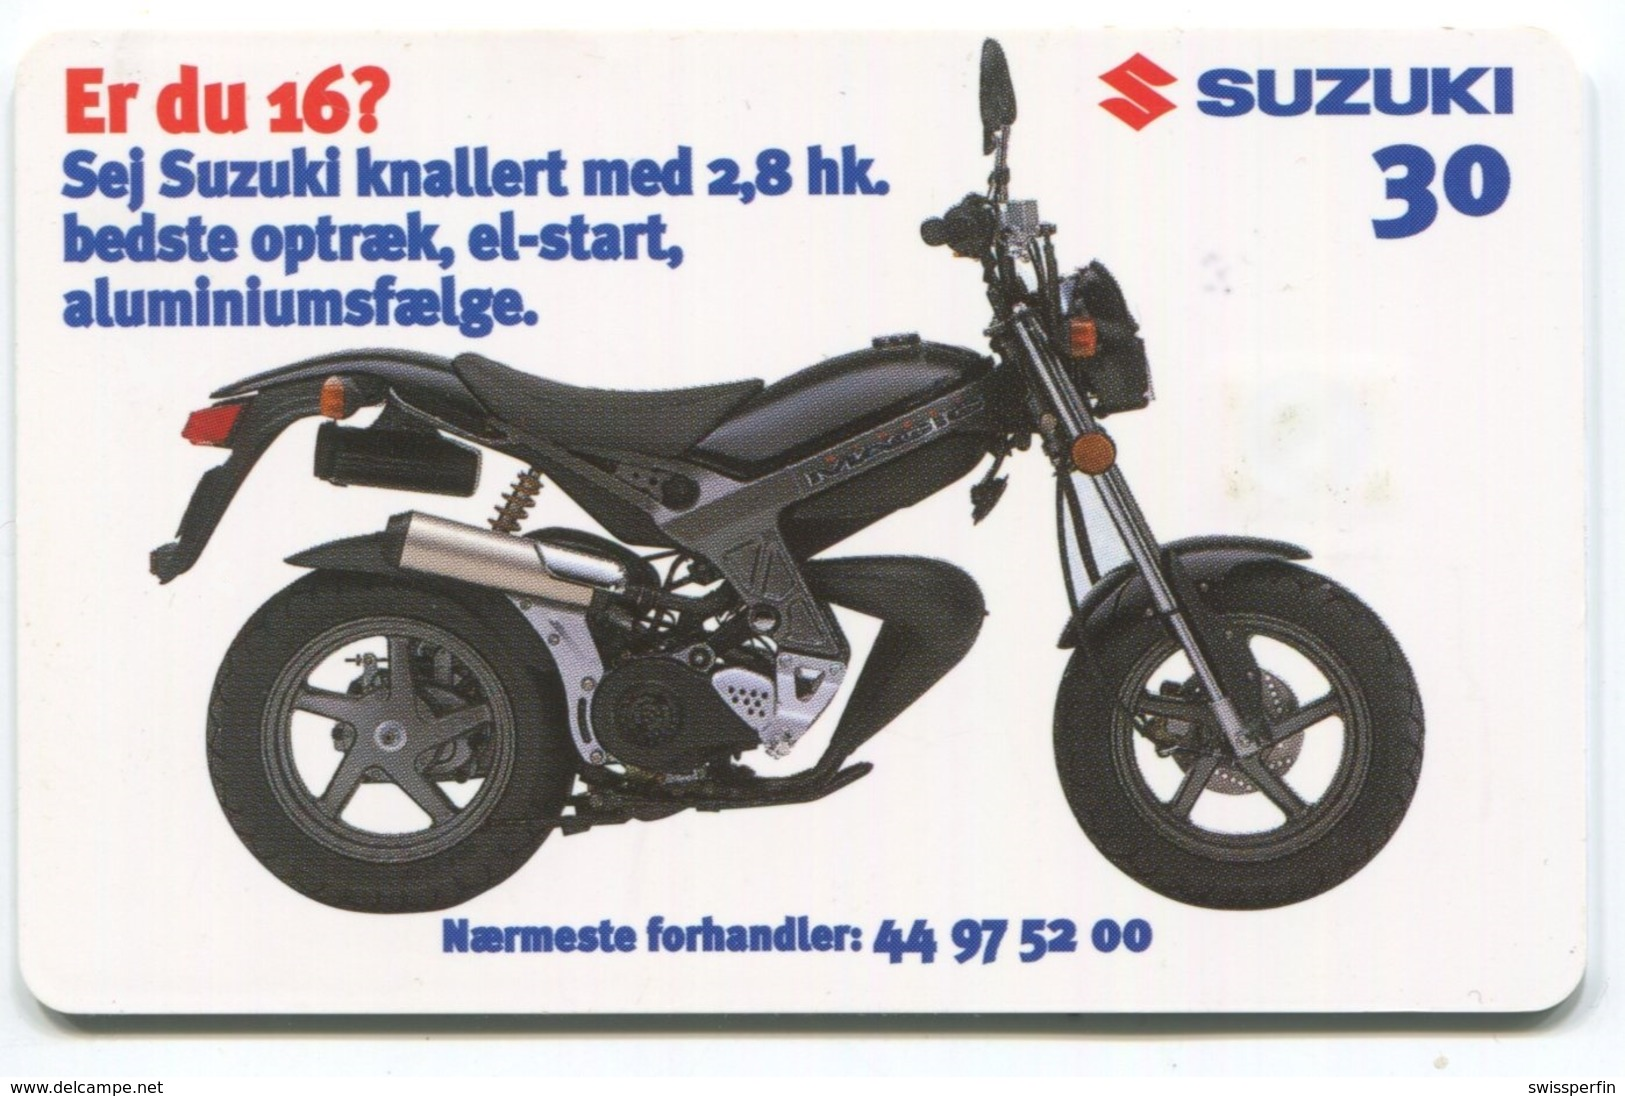 1825 - SUZUKI Motorrad - Dänische Telefonkarte - Motos